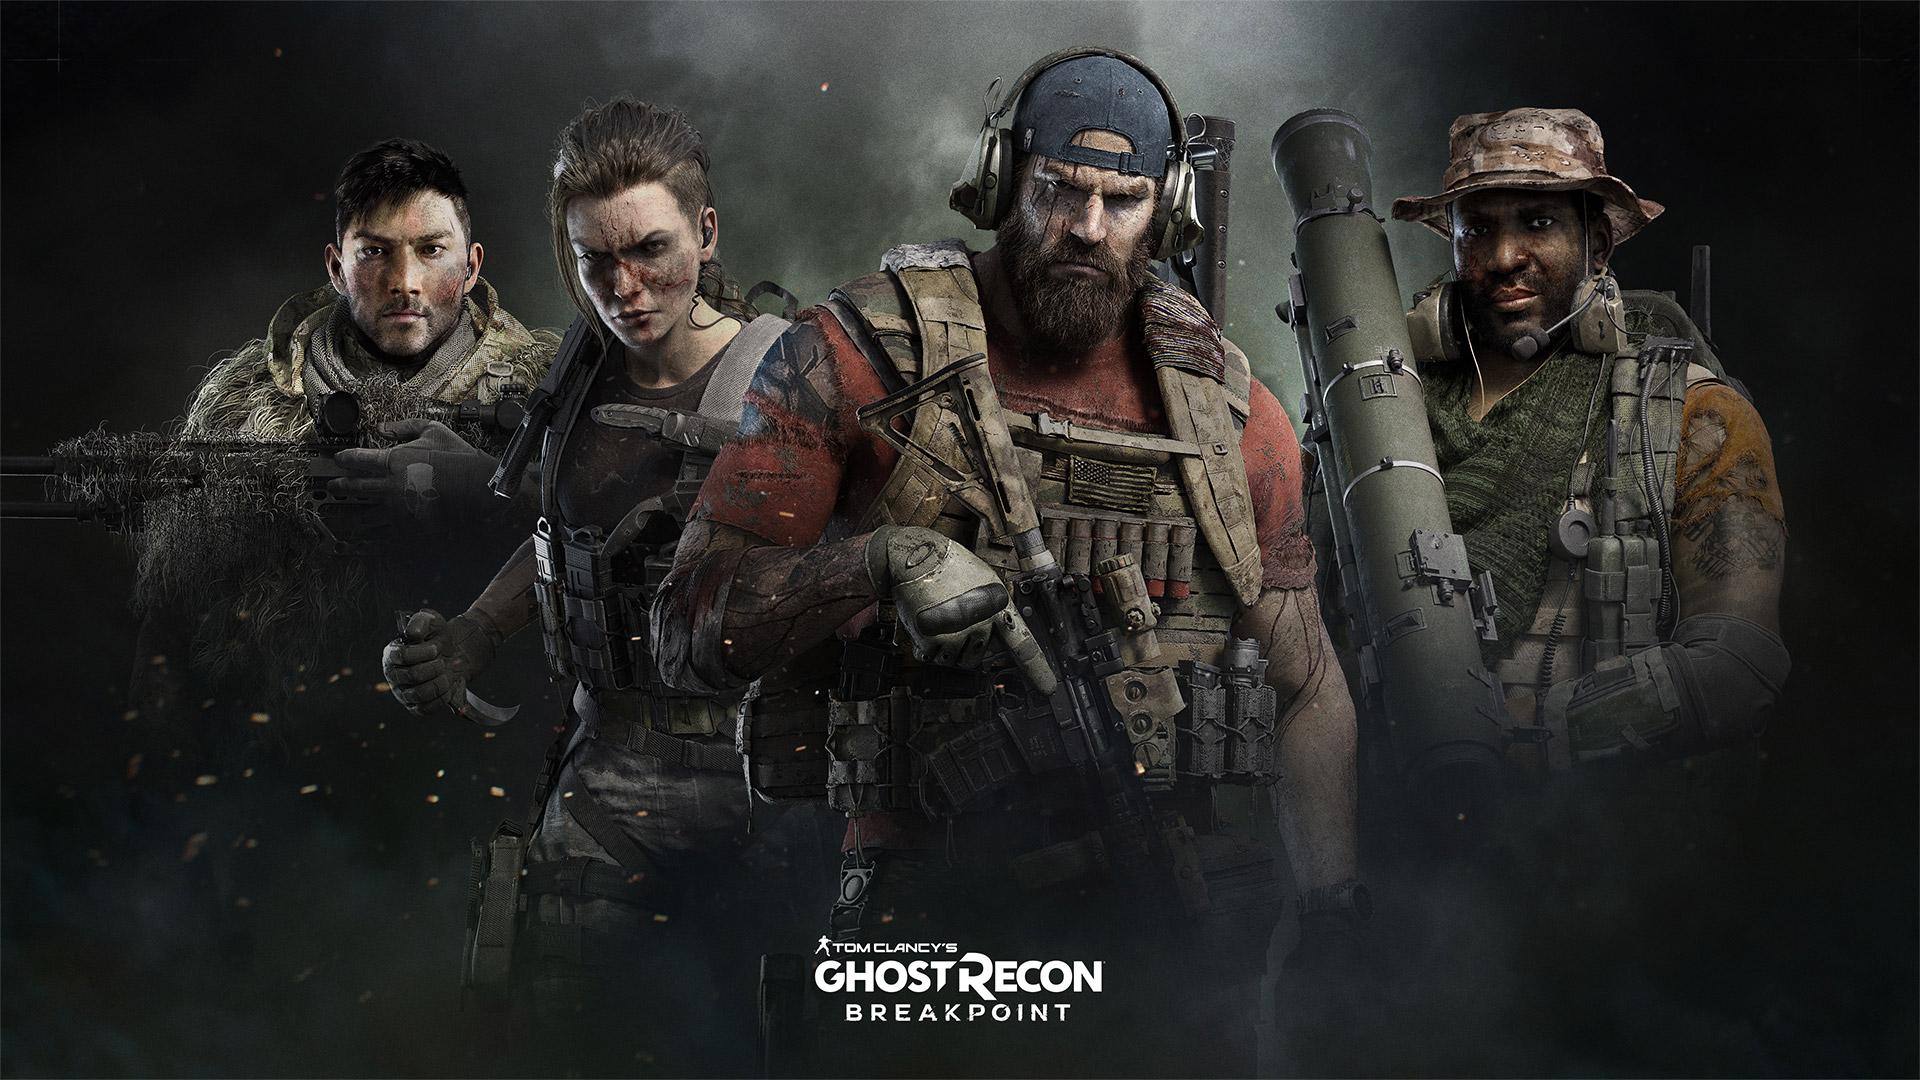 Гайд: По бивакам (лагерям) в Ghost Recon: Breakpoint